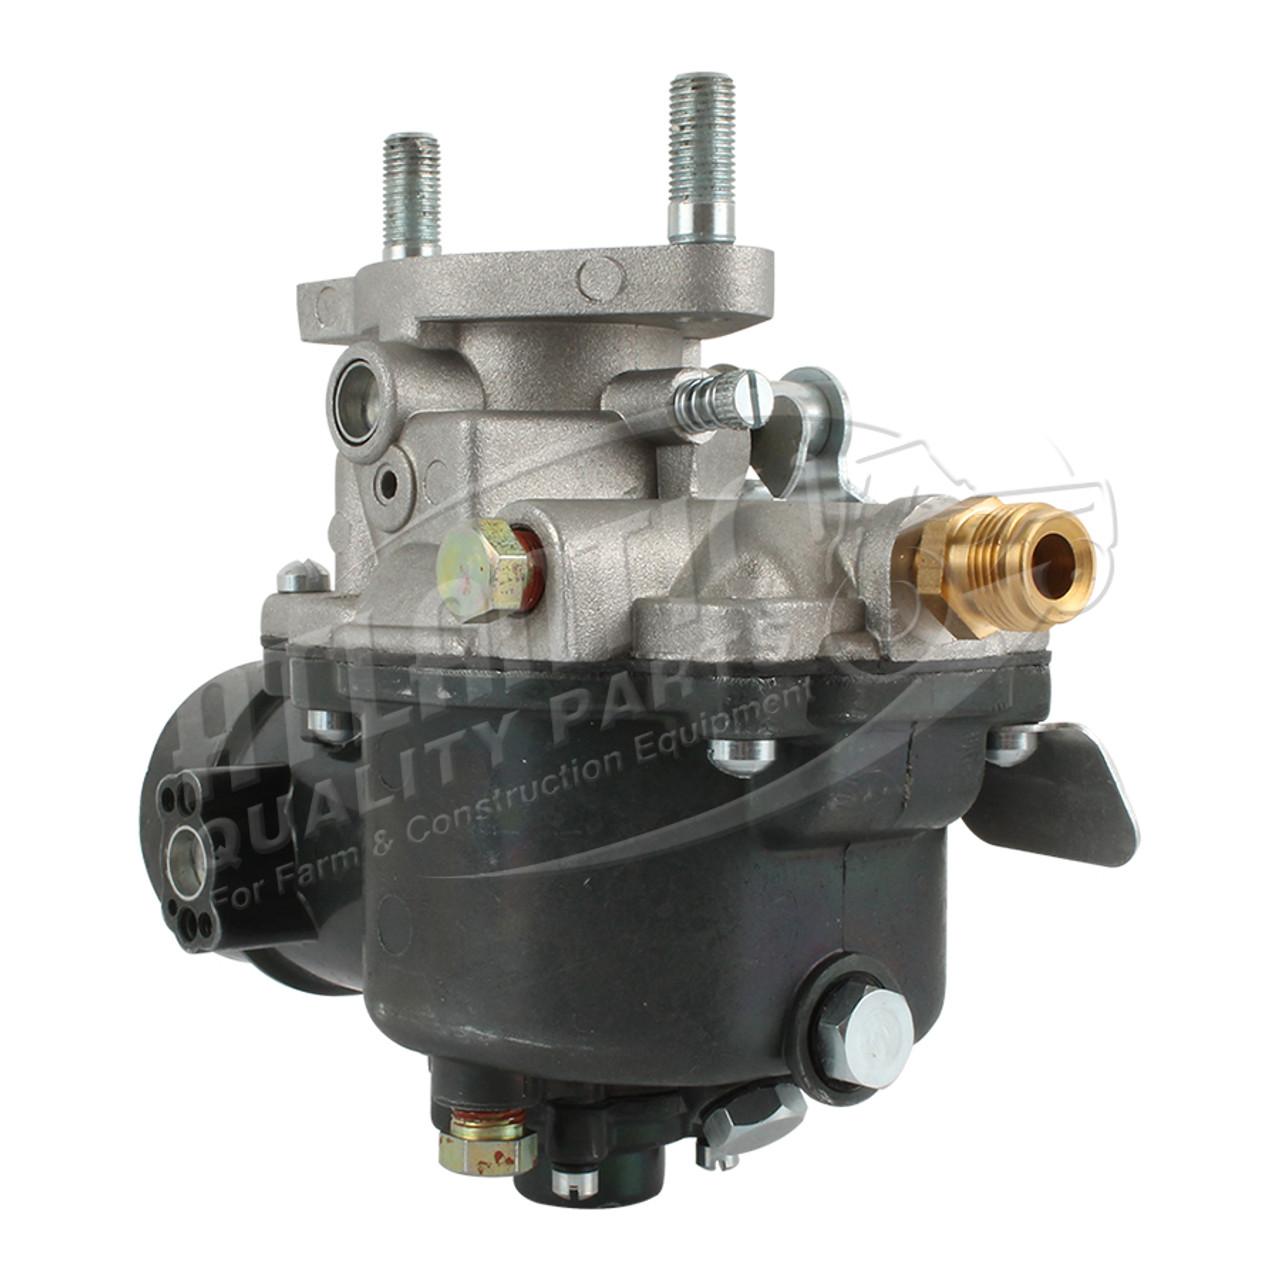 Carburetor  for Ford 2600, 3000 Series Tractors C5NE9510C, C5NN9510M